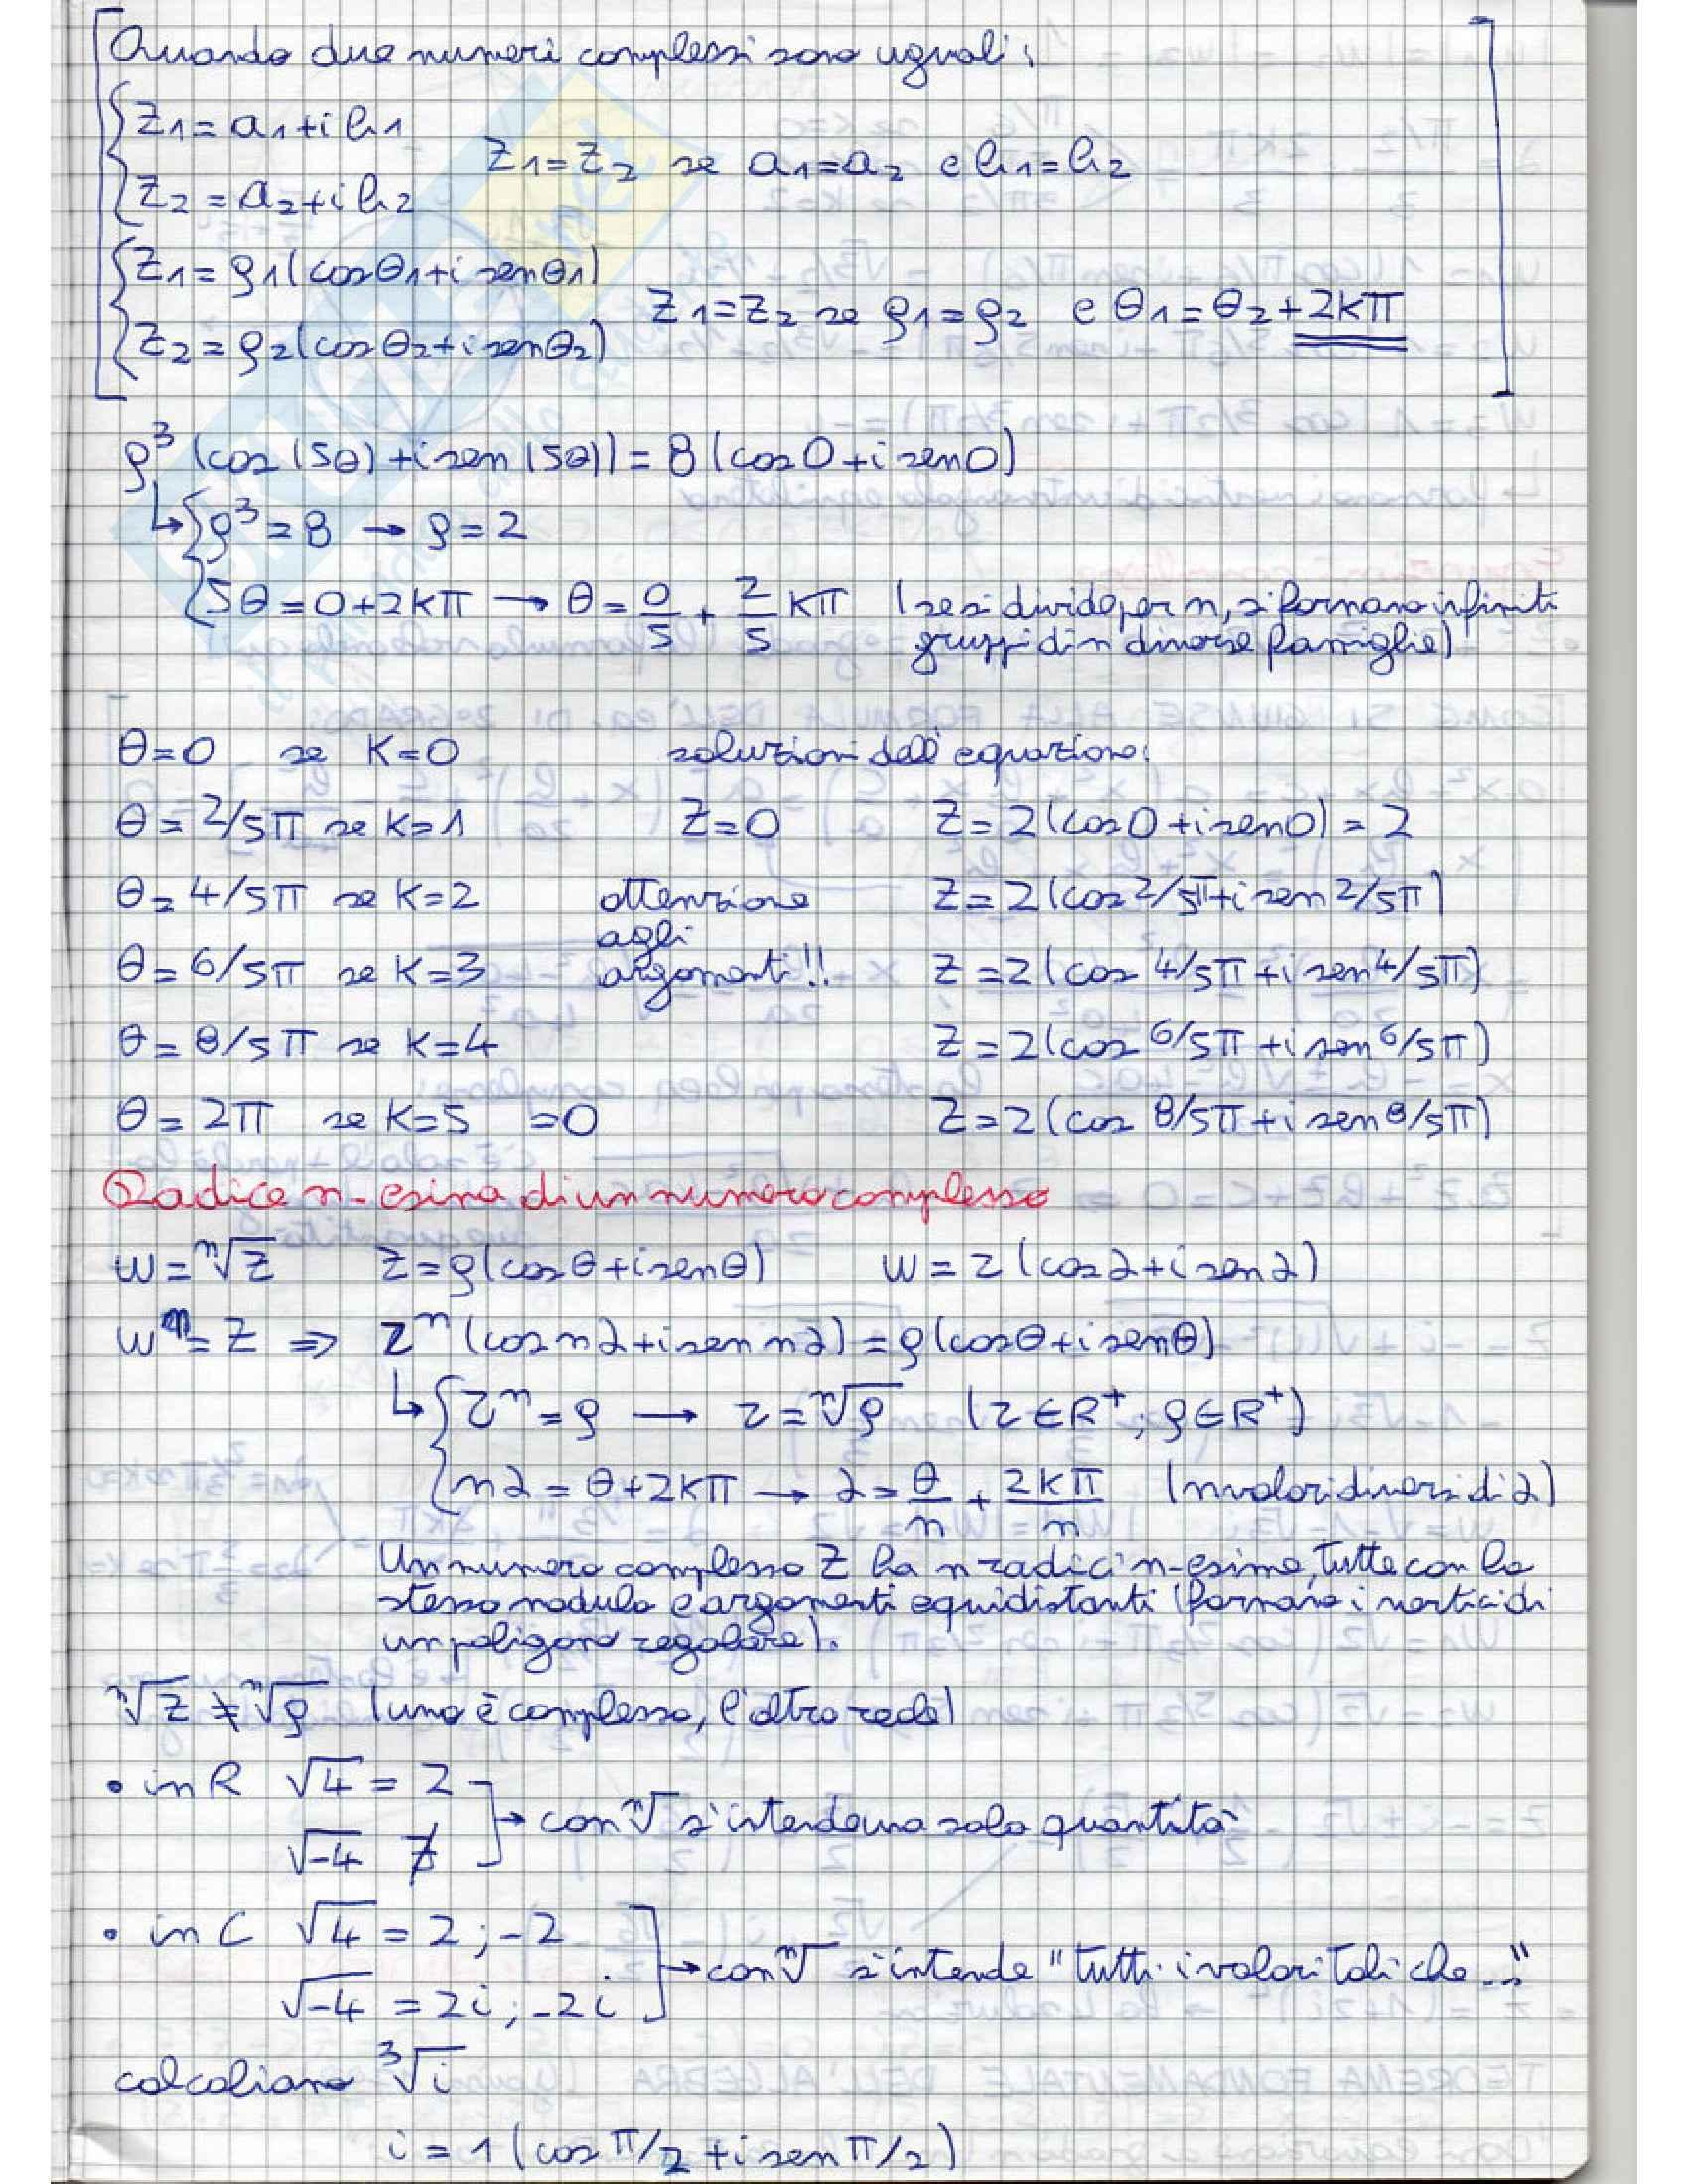 Analisi e geometria 1 - appunti Pag. 11